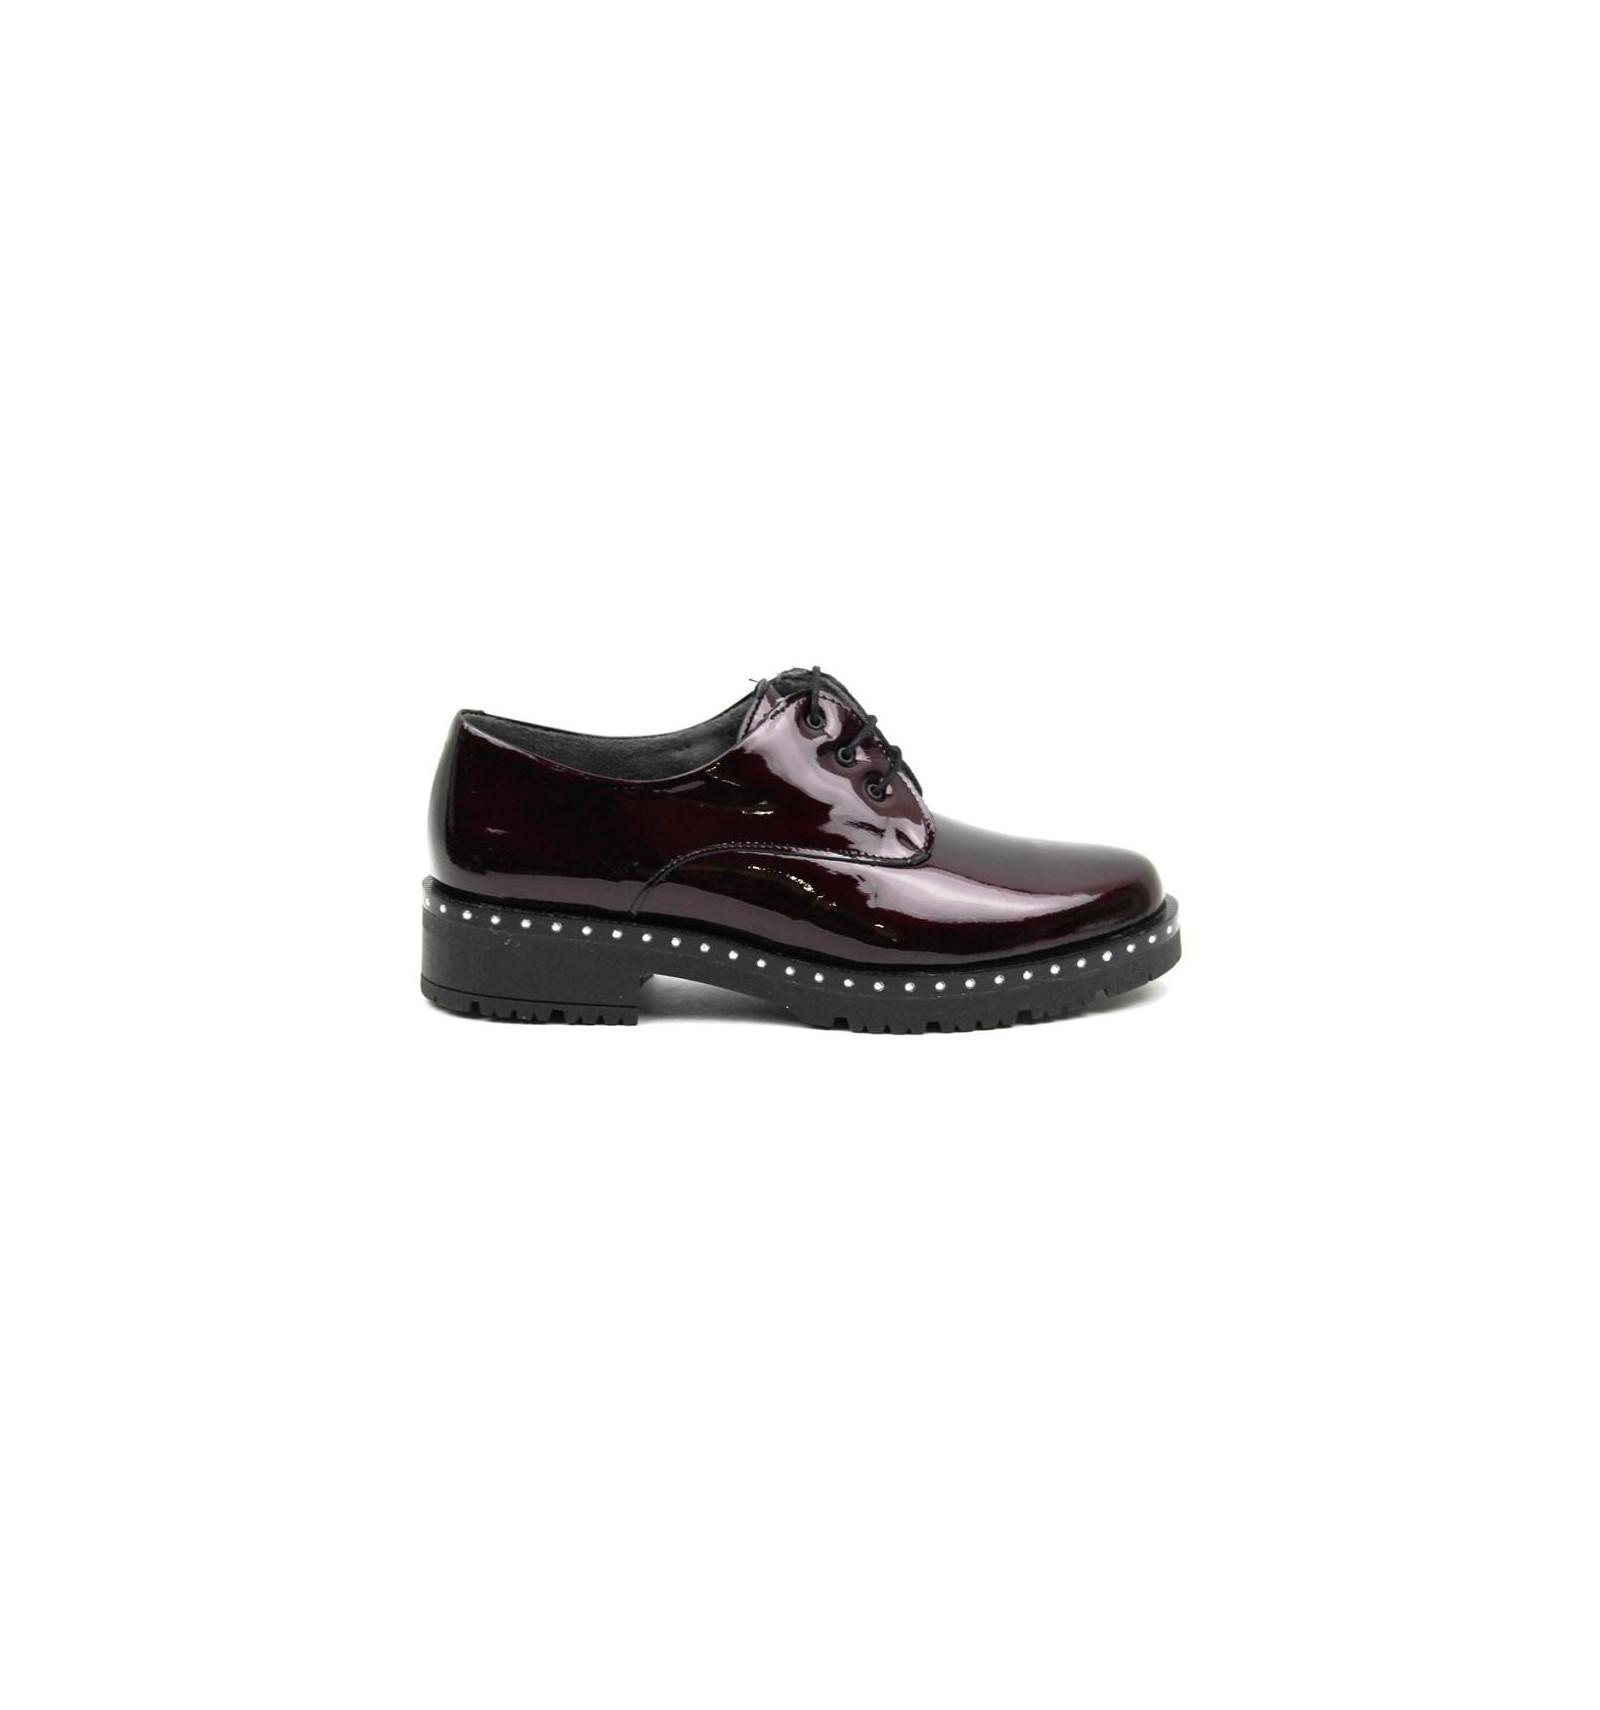 23dc85c0887 Pitillos-5335 - ADN Shoes